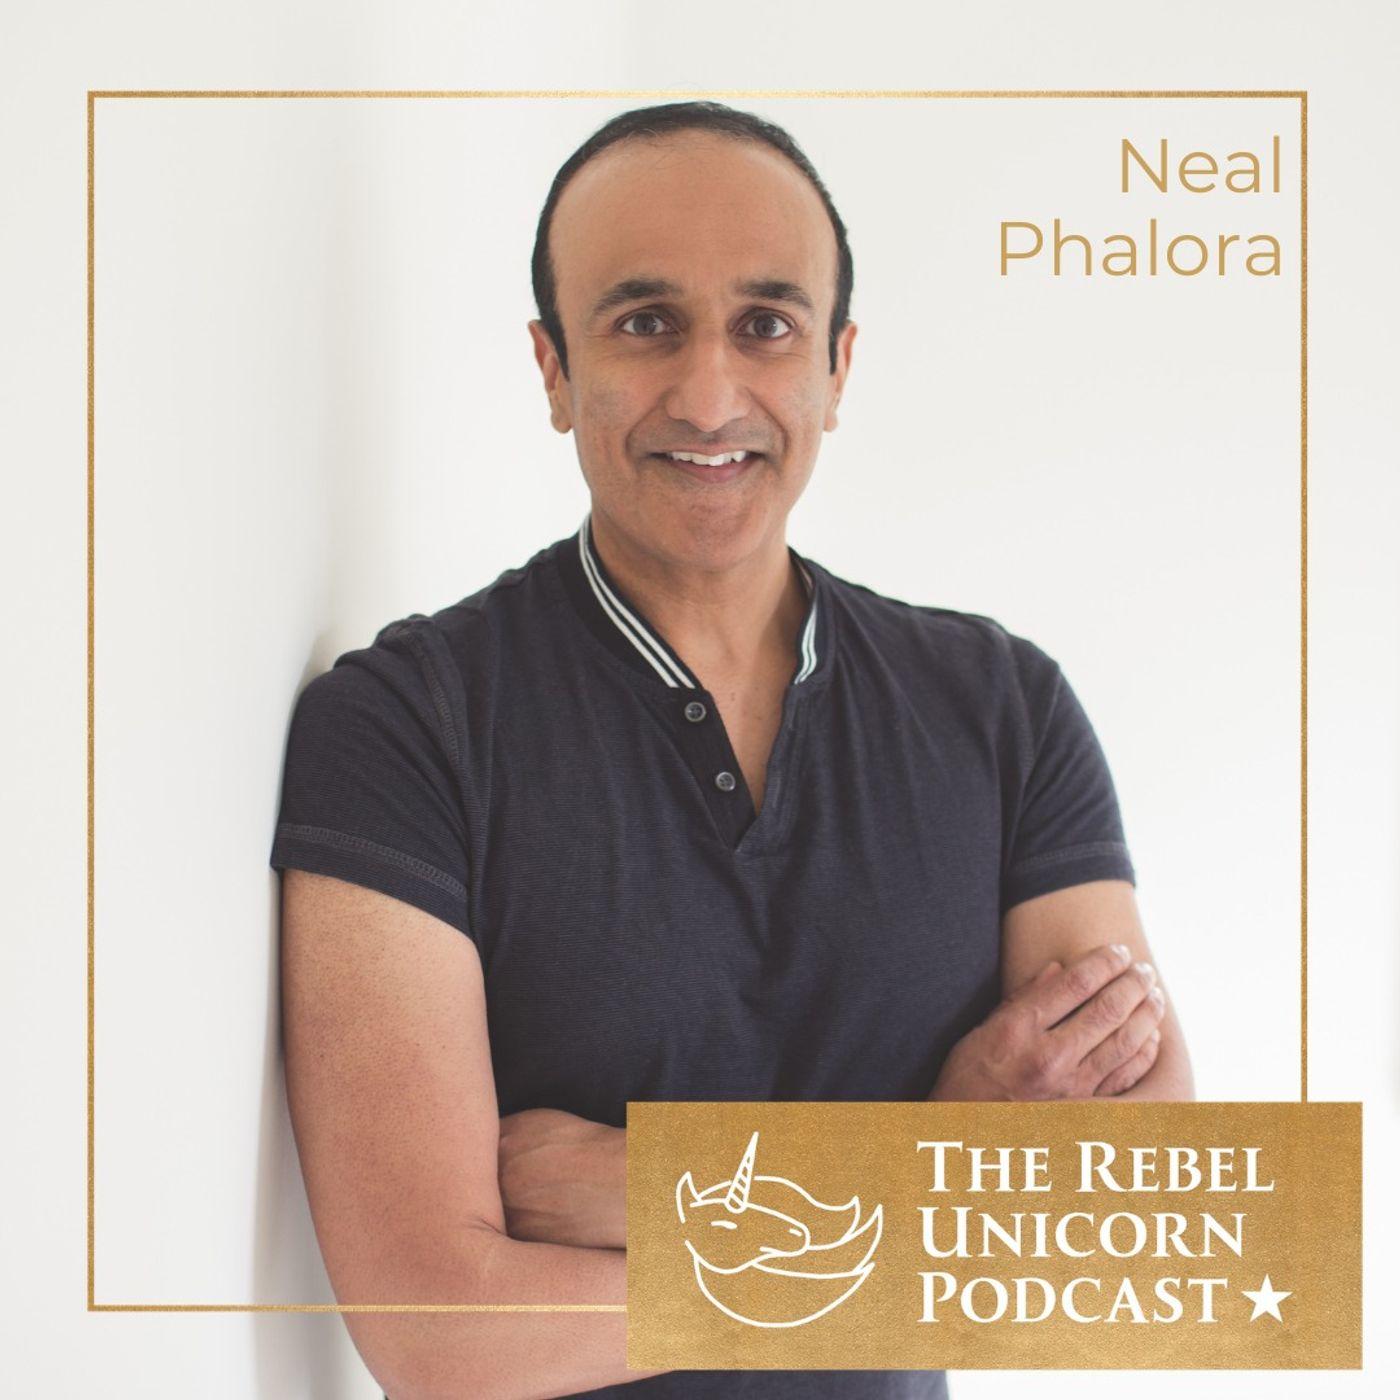 Third Eye with Neal Phalora